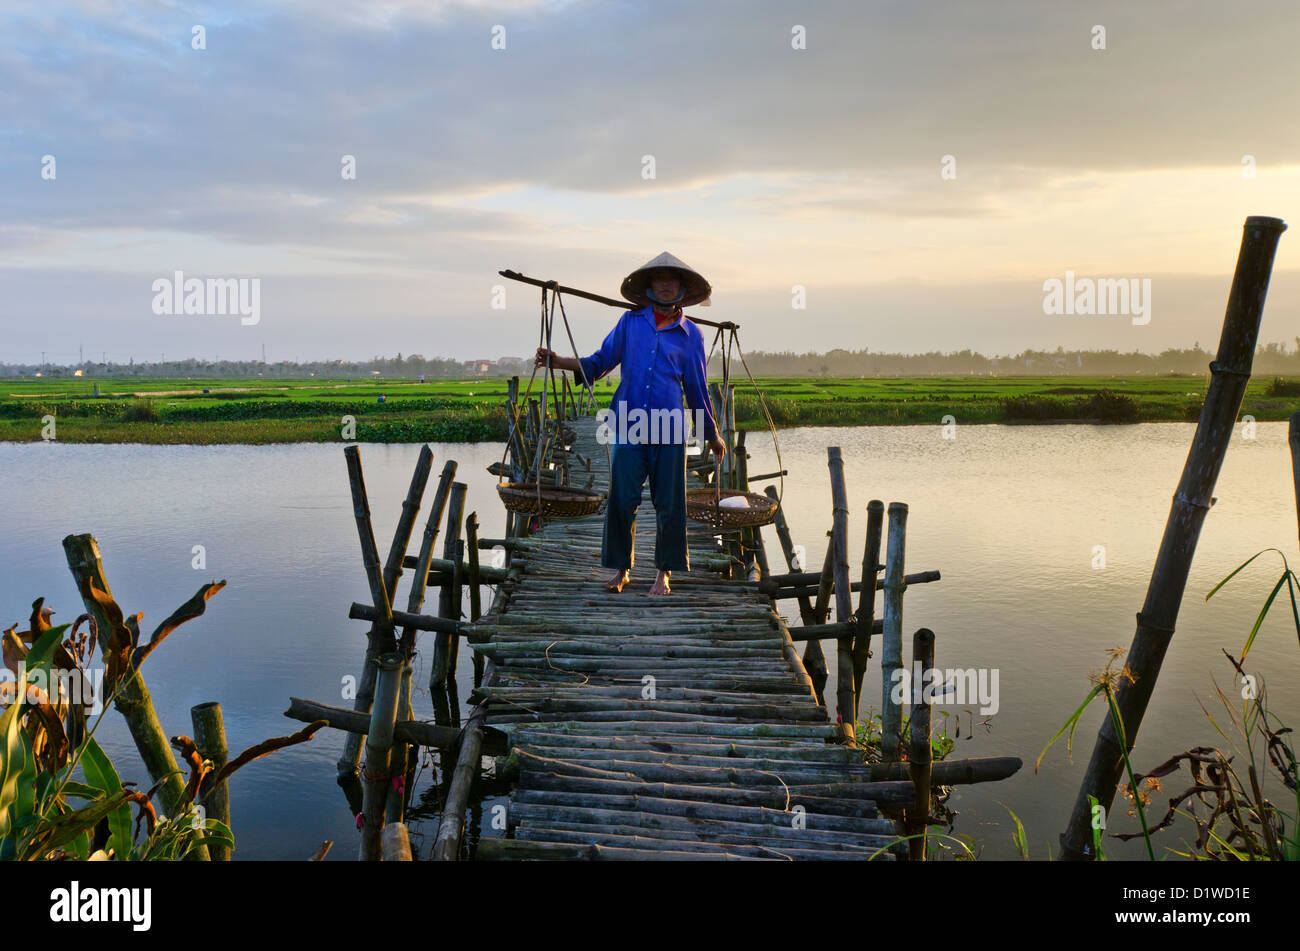 Woman carrying yoke baskets over bamboo bridge, Vietnam - Stock Image